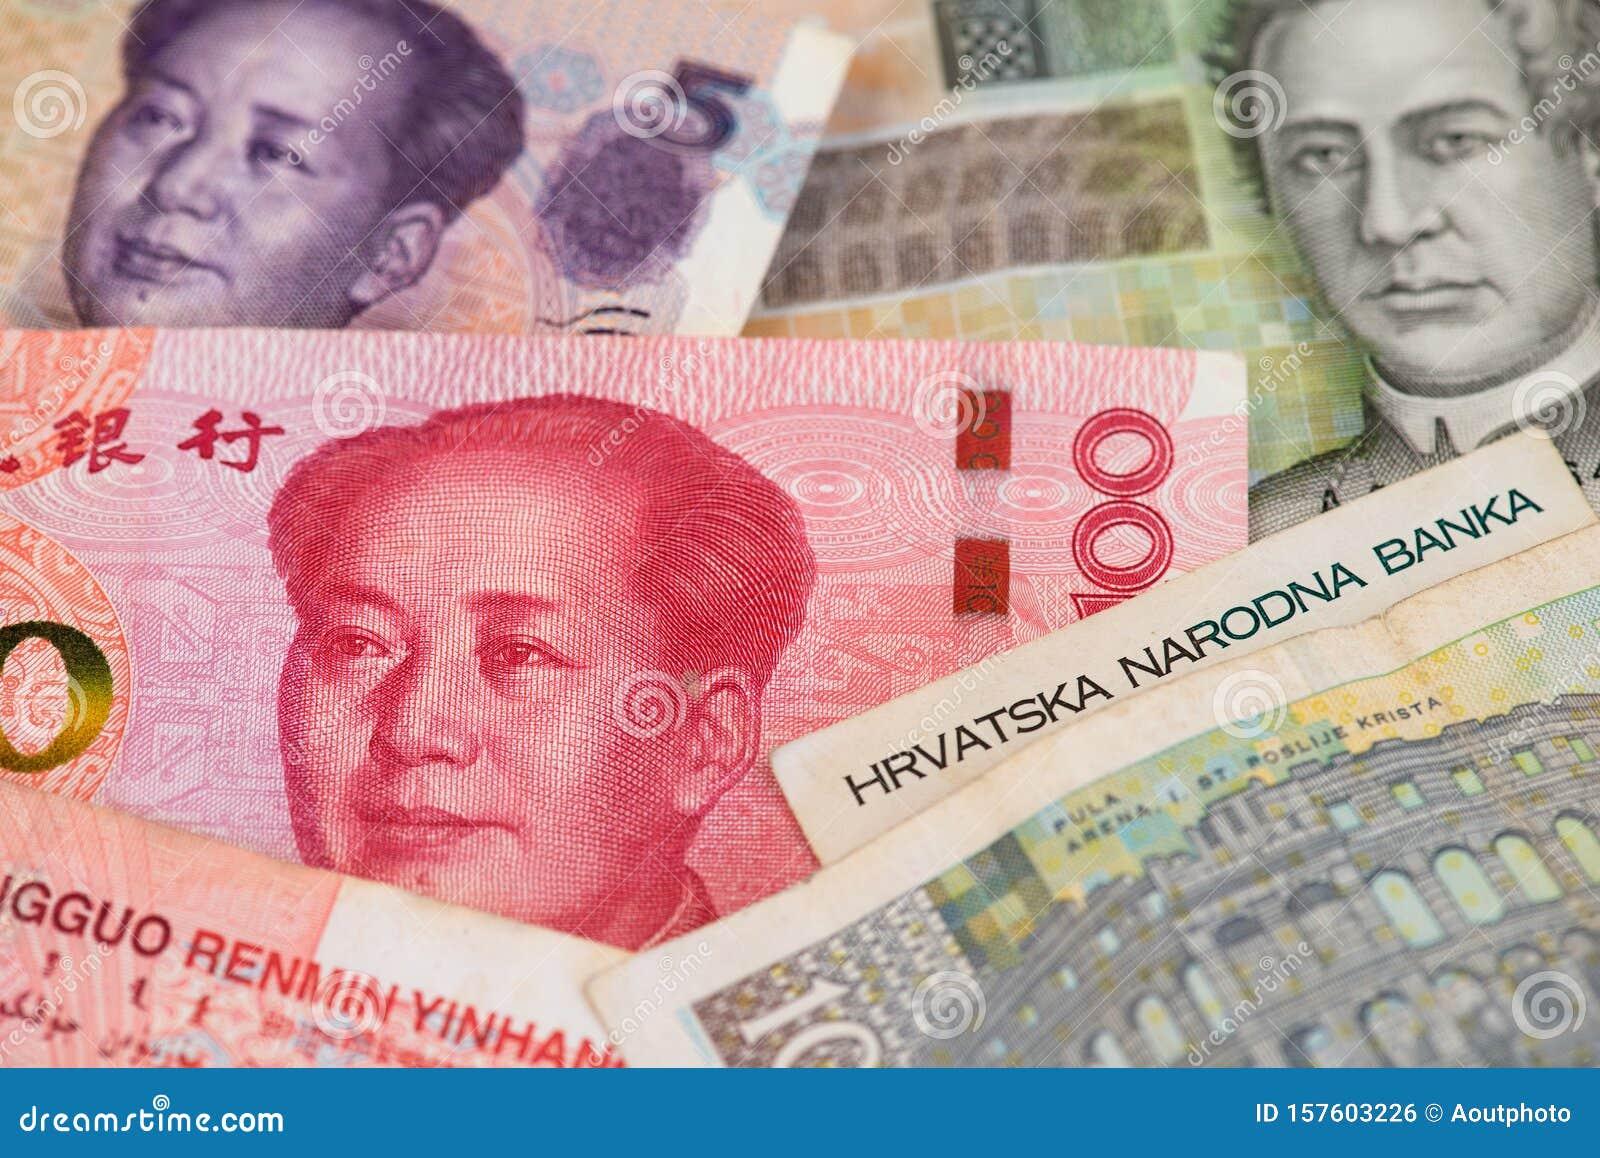 China Yuan Renminbi With Croatia Kuna Currency Banknotes